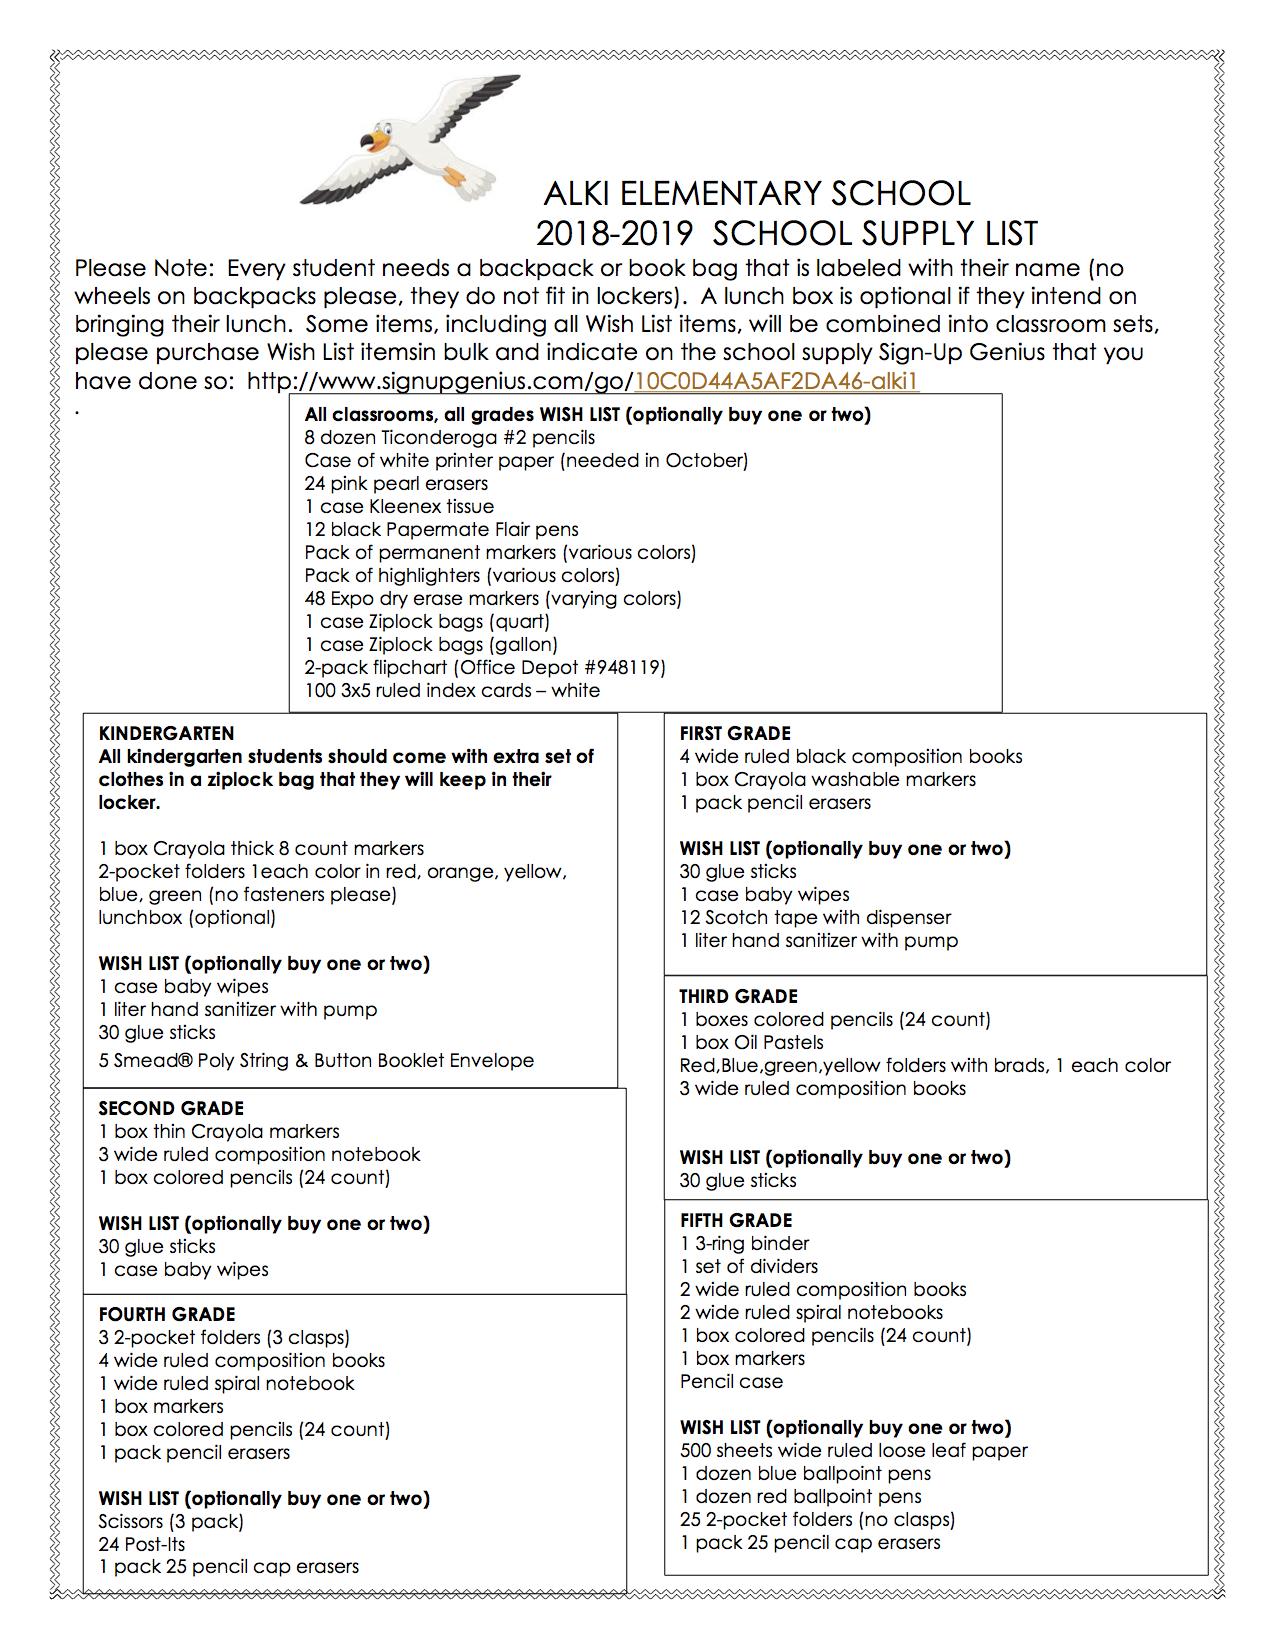 Alki Elementary School Supply List 2018/19 – ALKI ELEMENTARY PTA